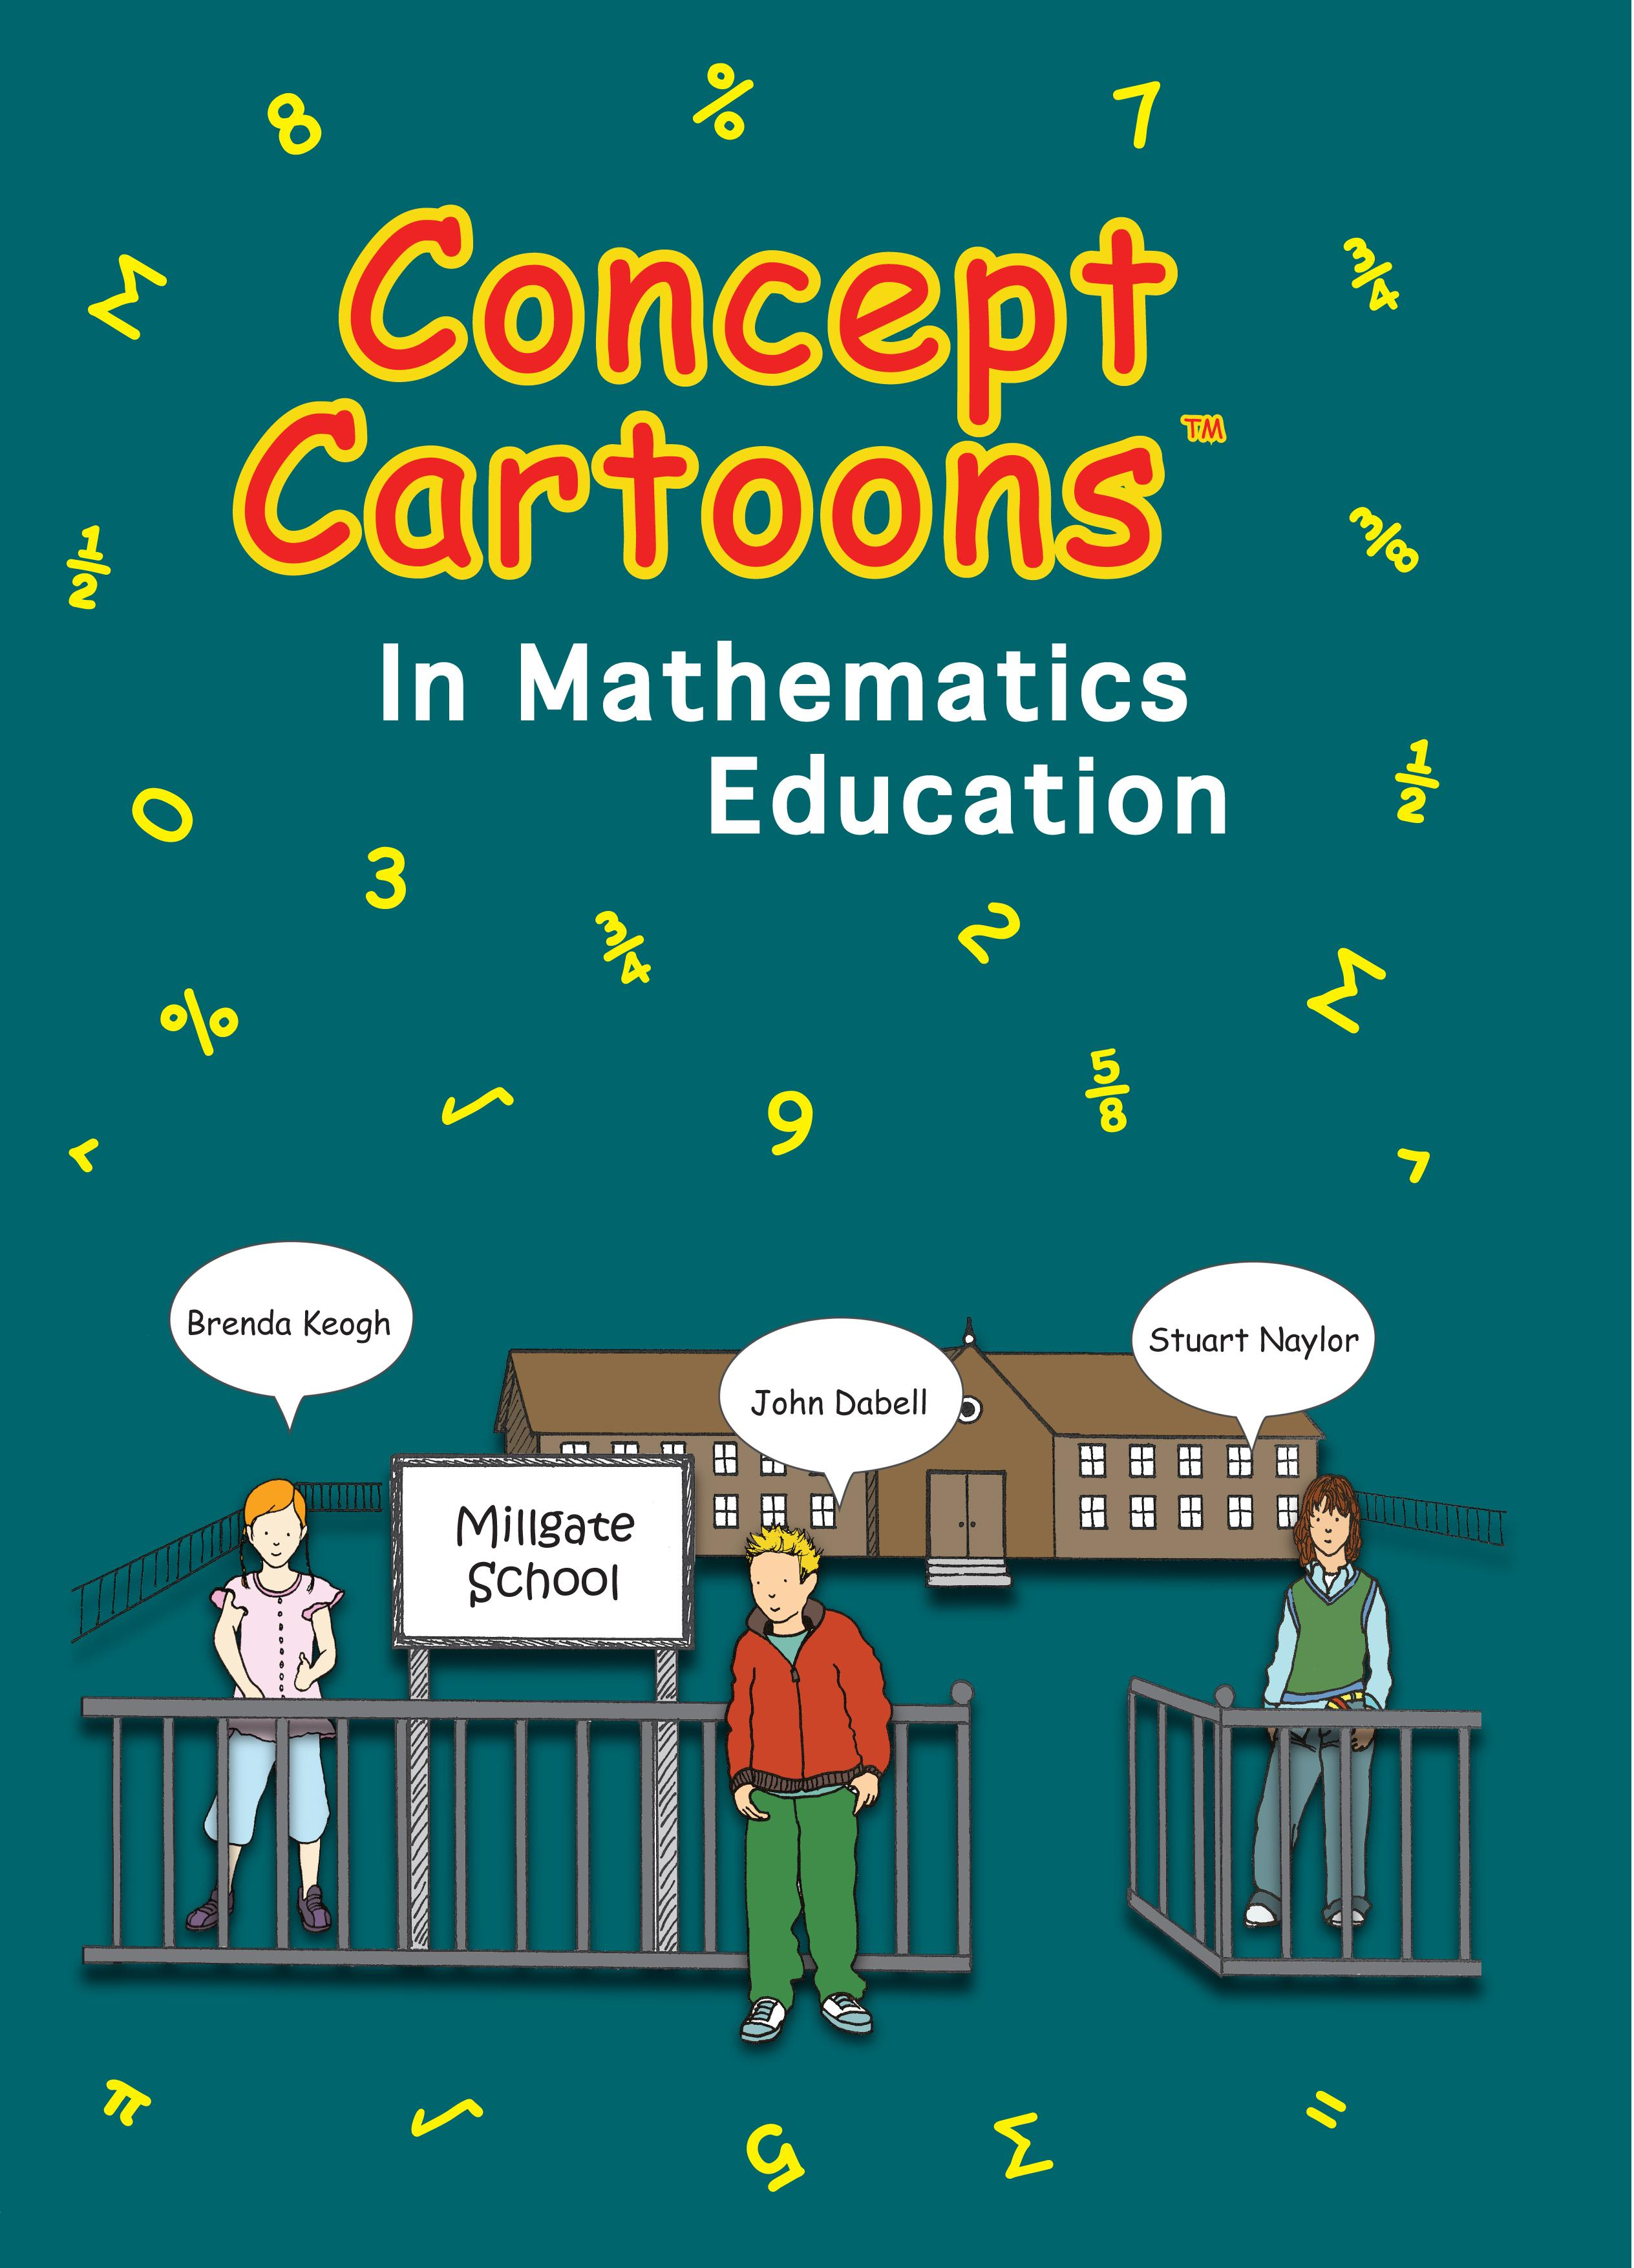 Concept Cartoons in Mathematics Education